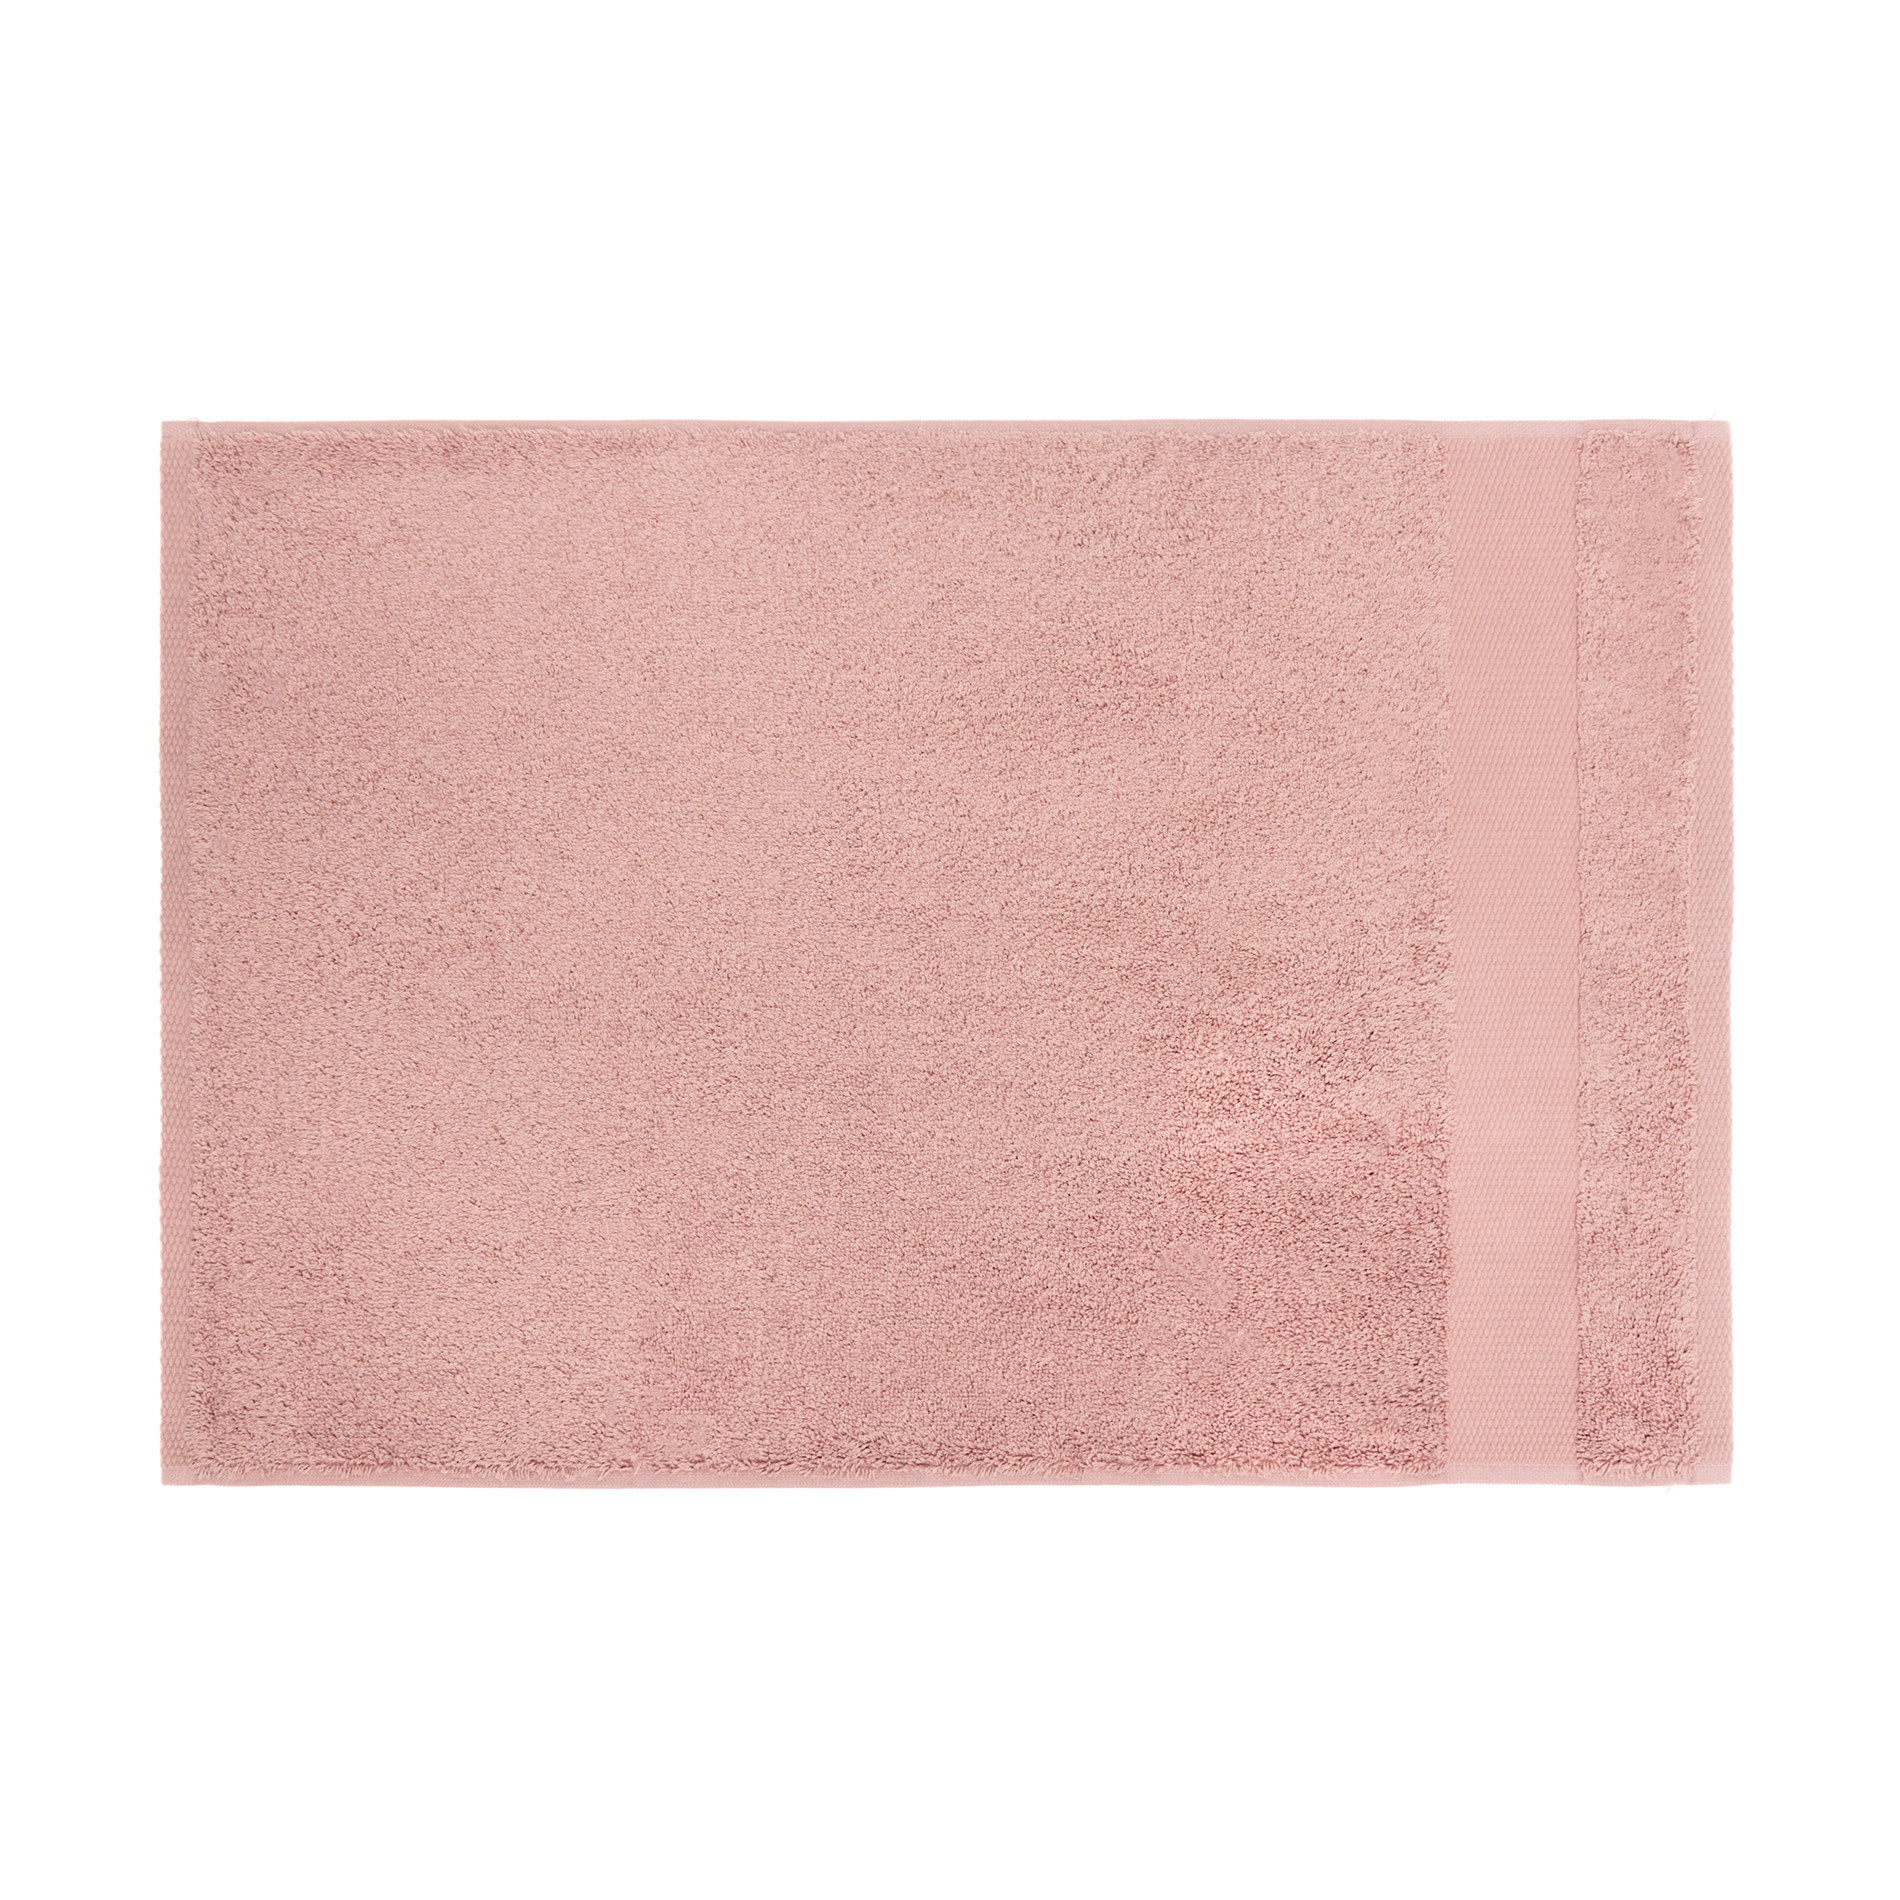 Asciugamano spugna di puro cotone Zefiro, Viola malva, large image number 2